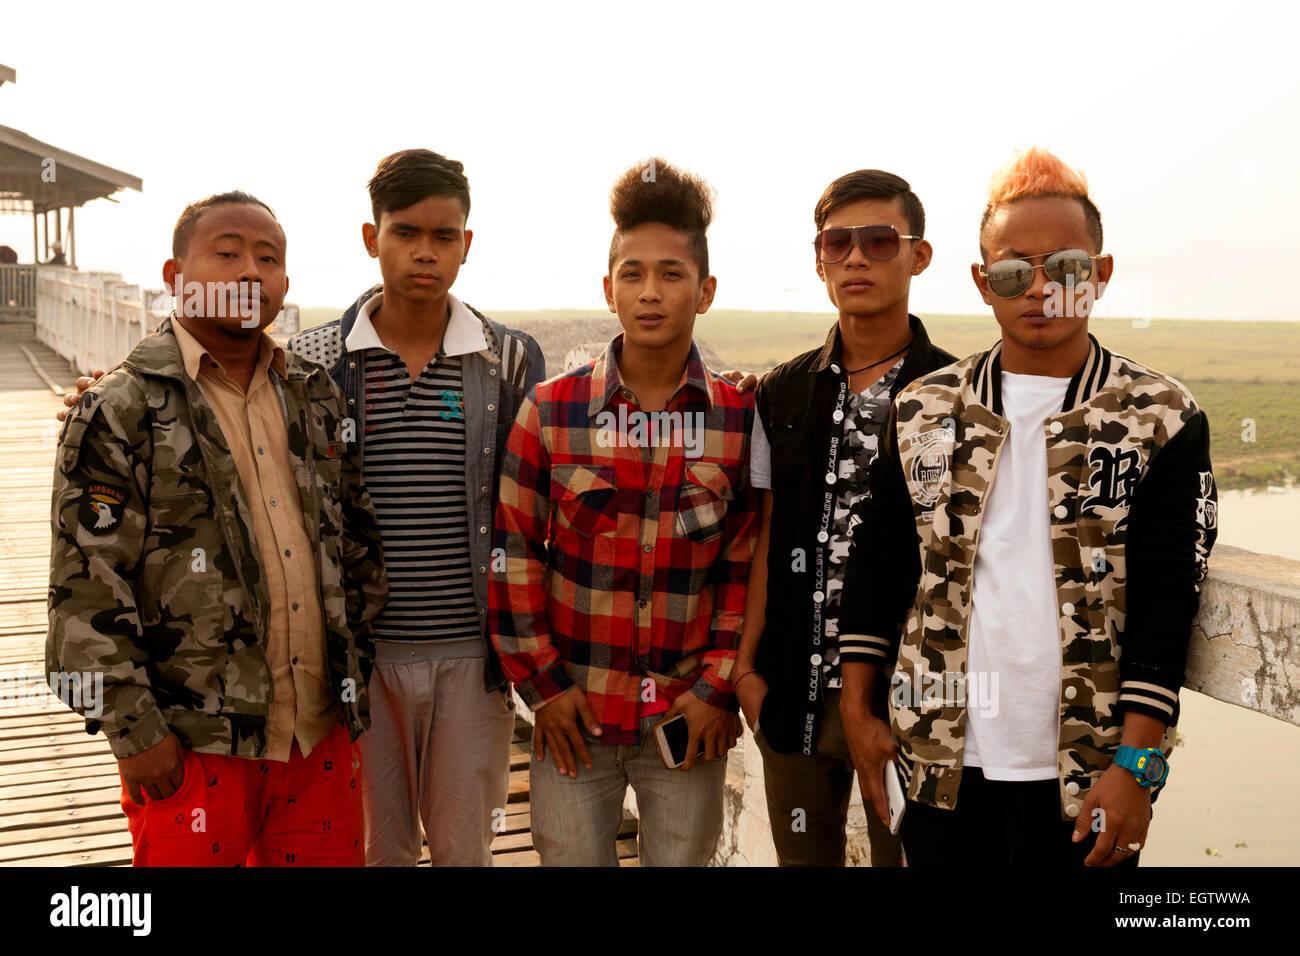 A group of five burmese teenager boys, Mandalay, Myanmar ( Burma ), Asia - Stock Image